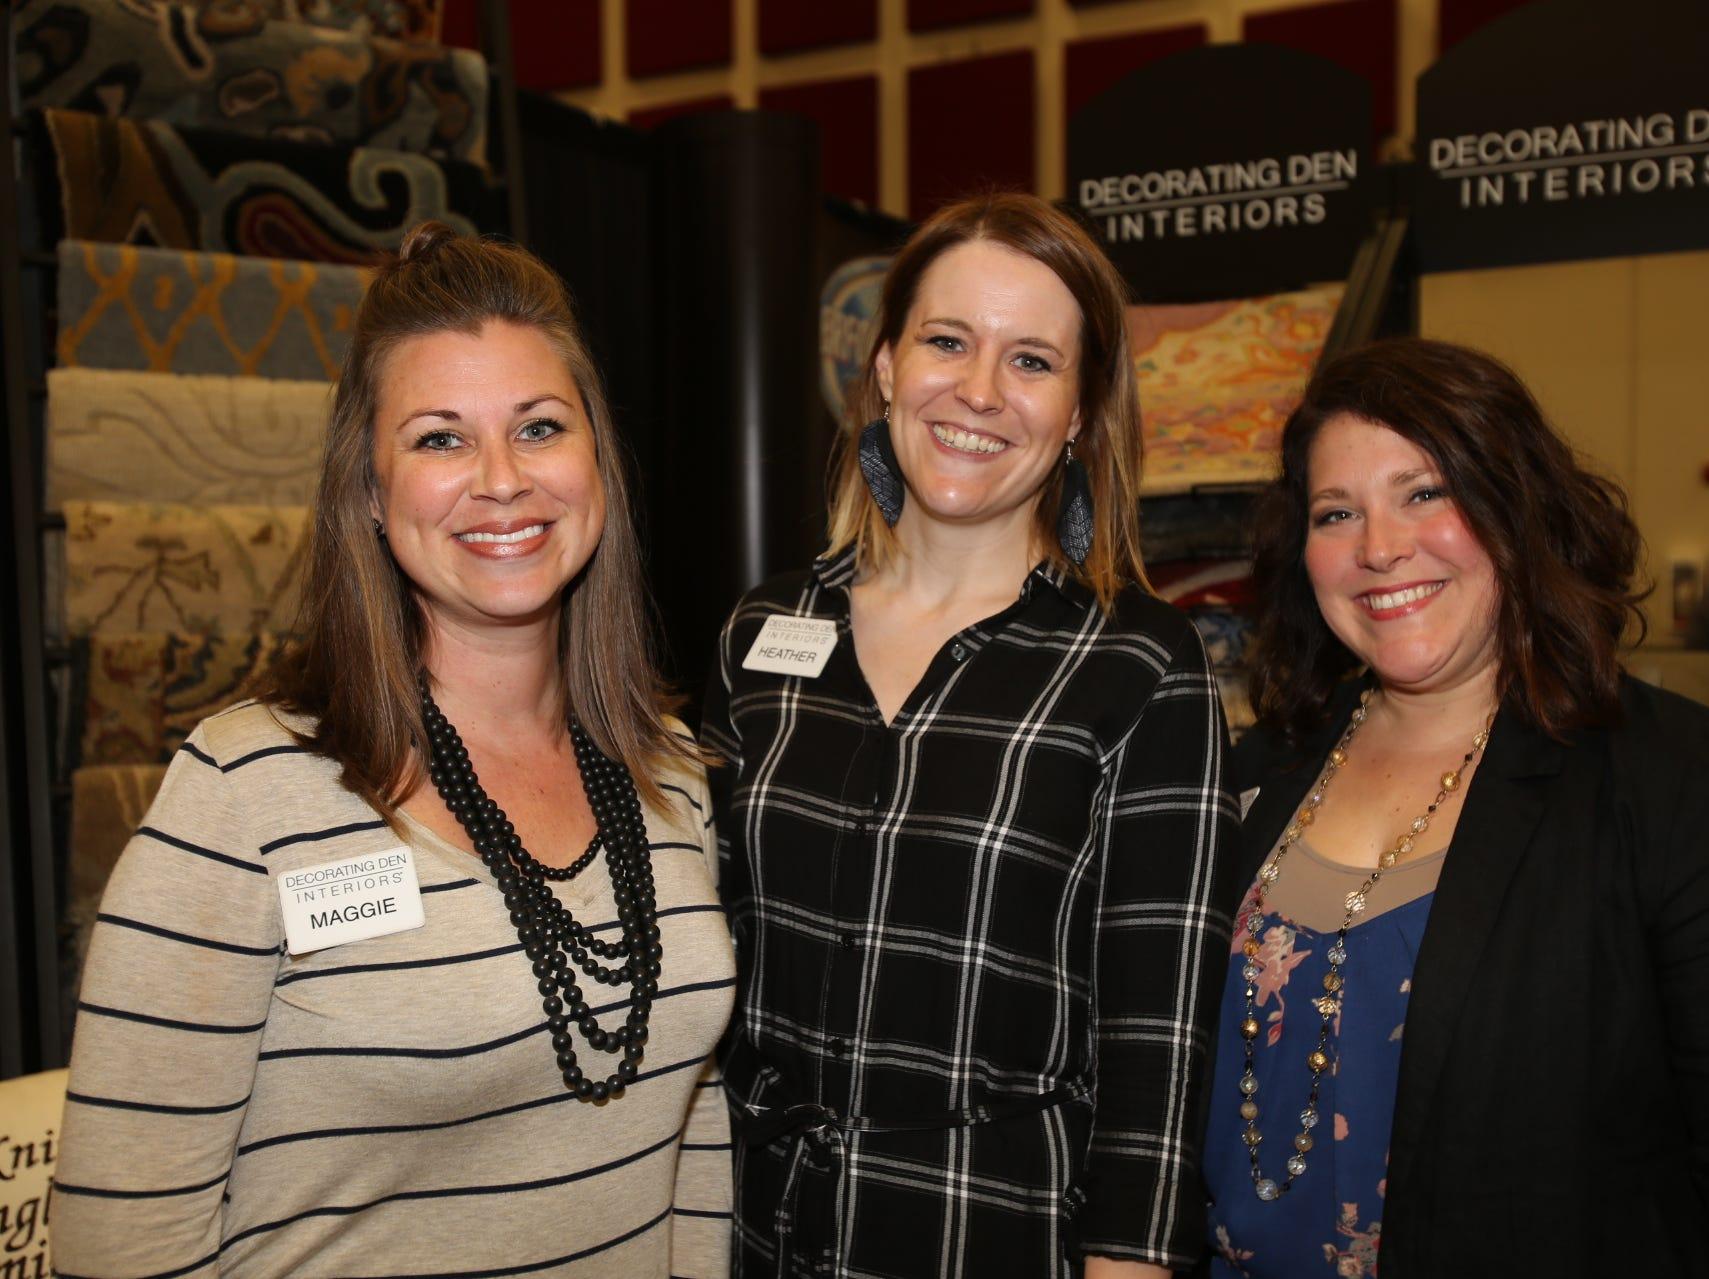 Maggie Kicklighter, Heather Smith, and Jillian Johnson